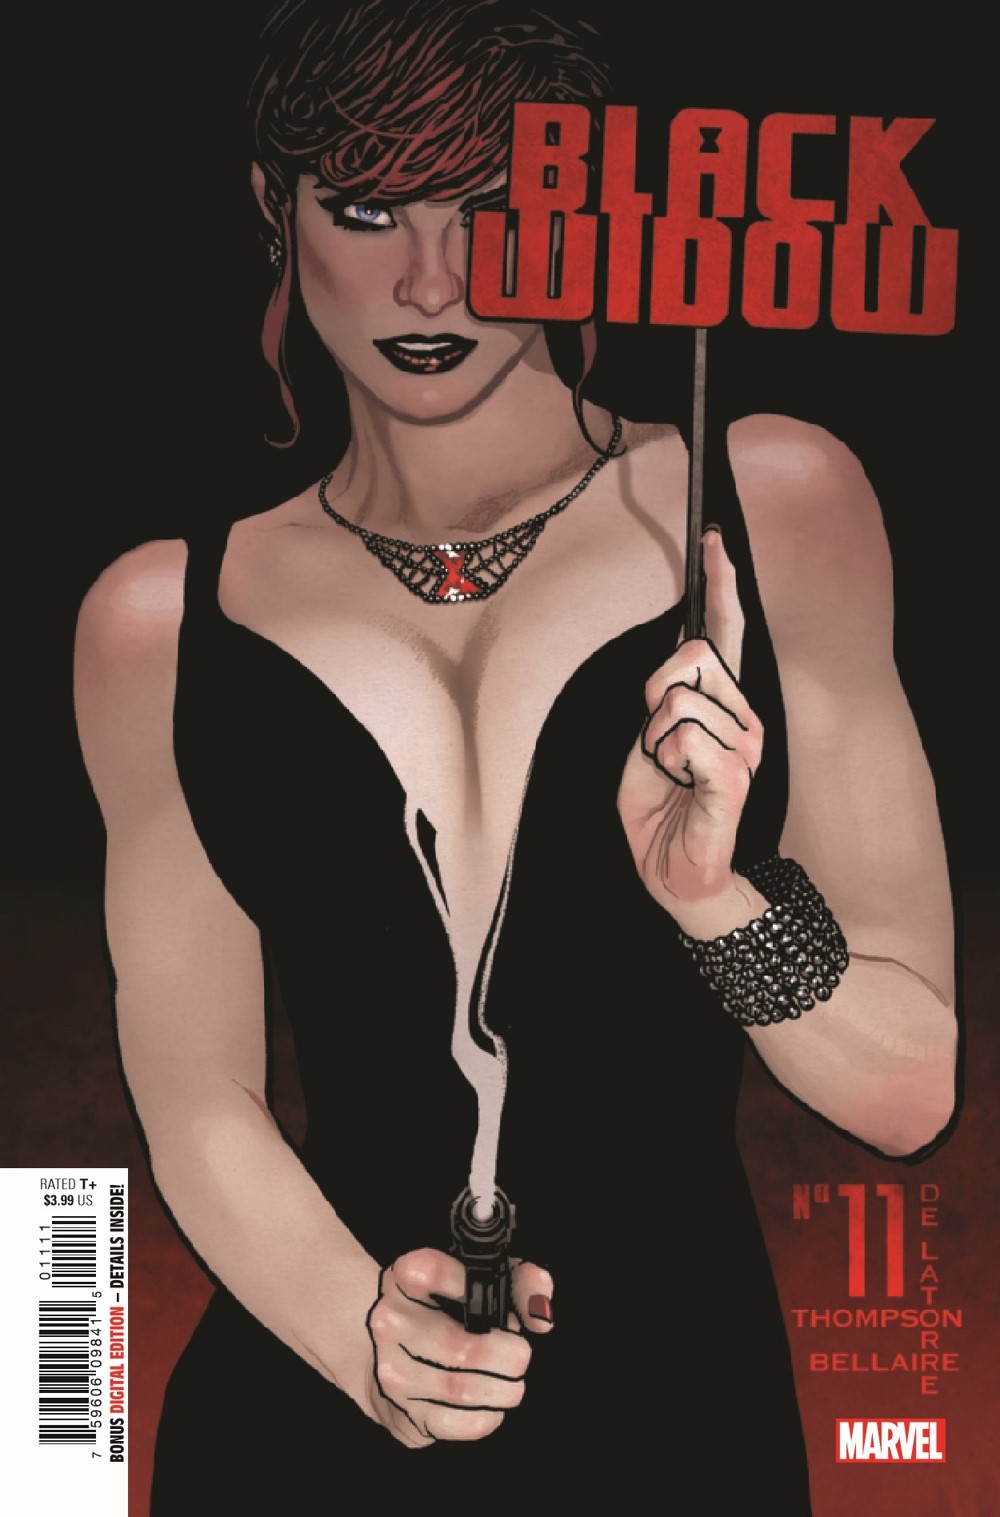 BLAW2020011_Preview-1 ComicList Previews: BLACK WIDOW #11